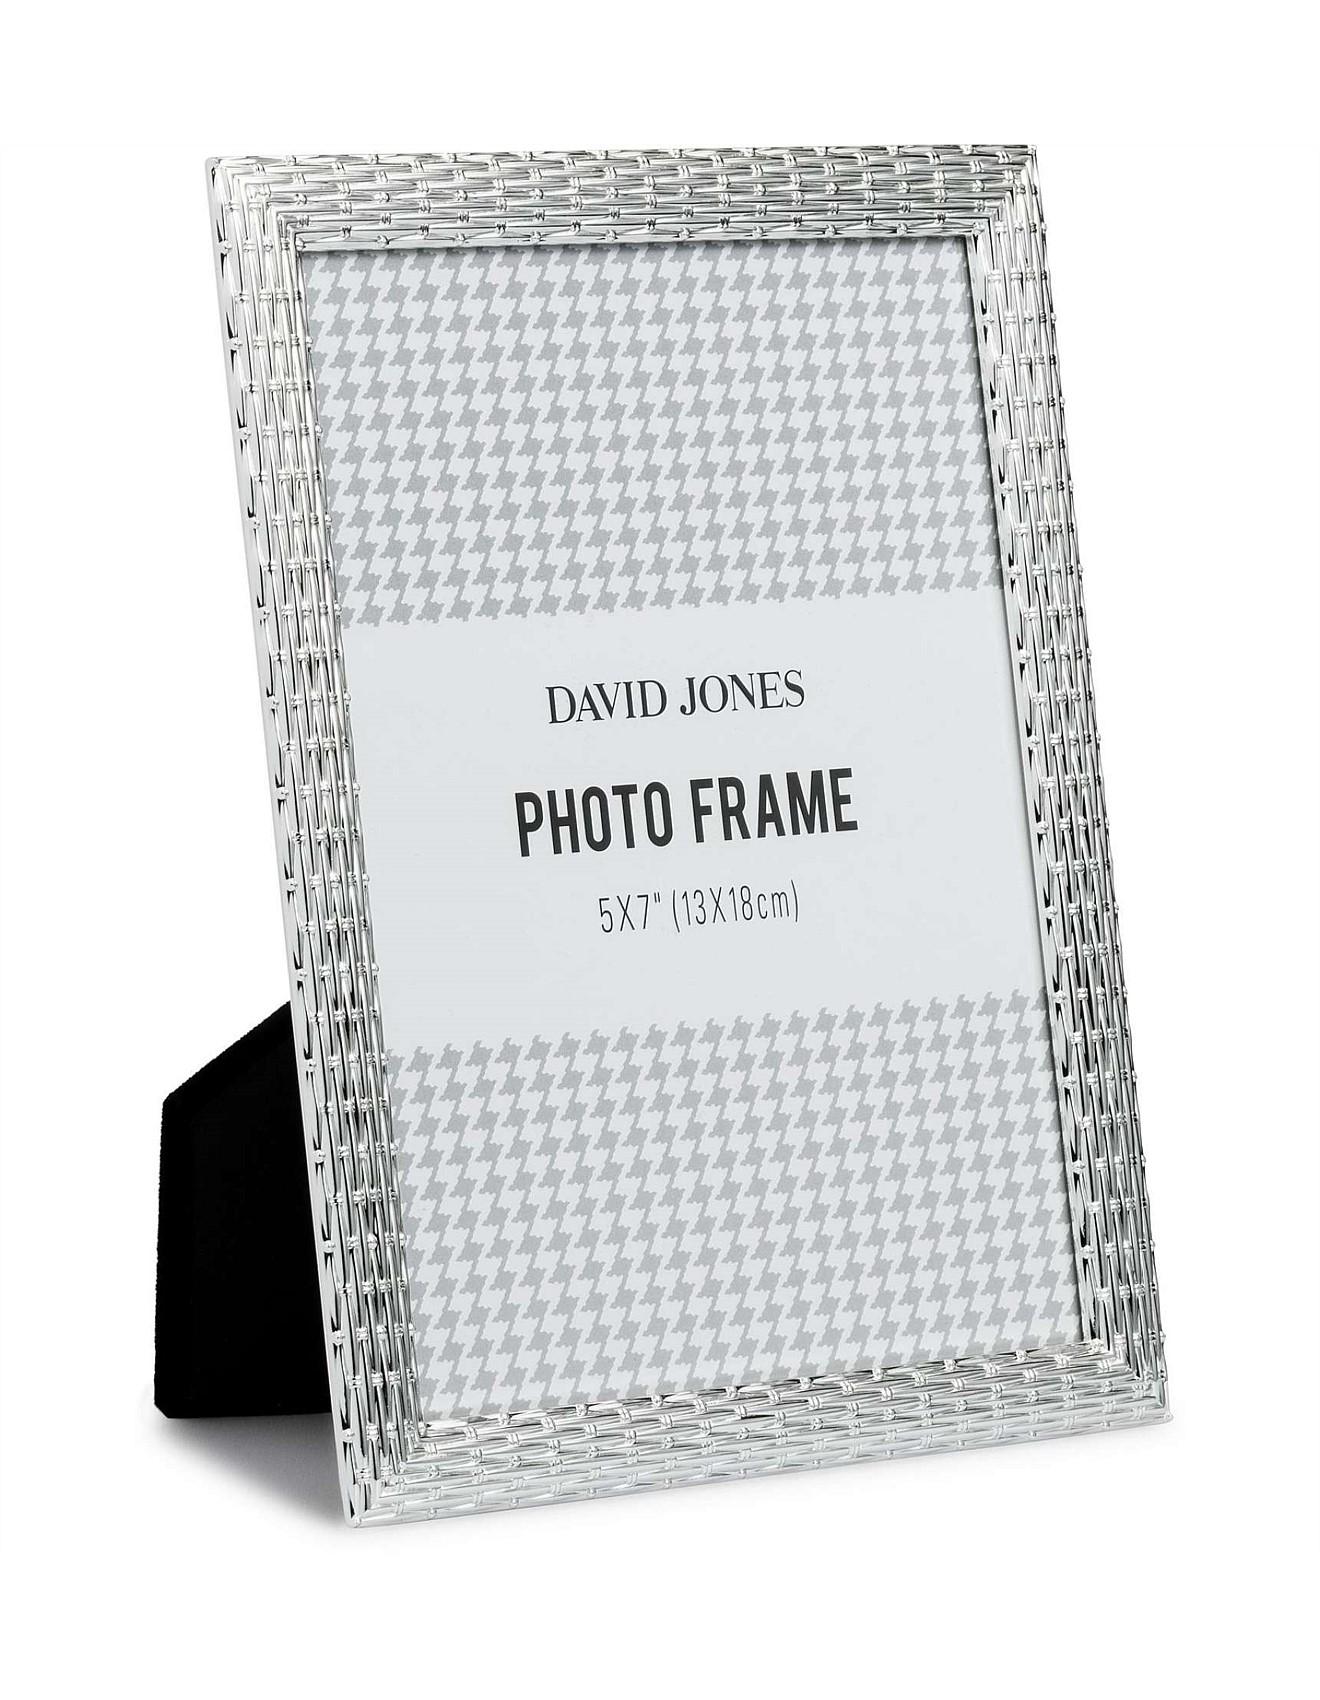 Photo Frames & Albums | Picture Frames Online | David Jones - Wicker ...